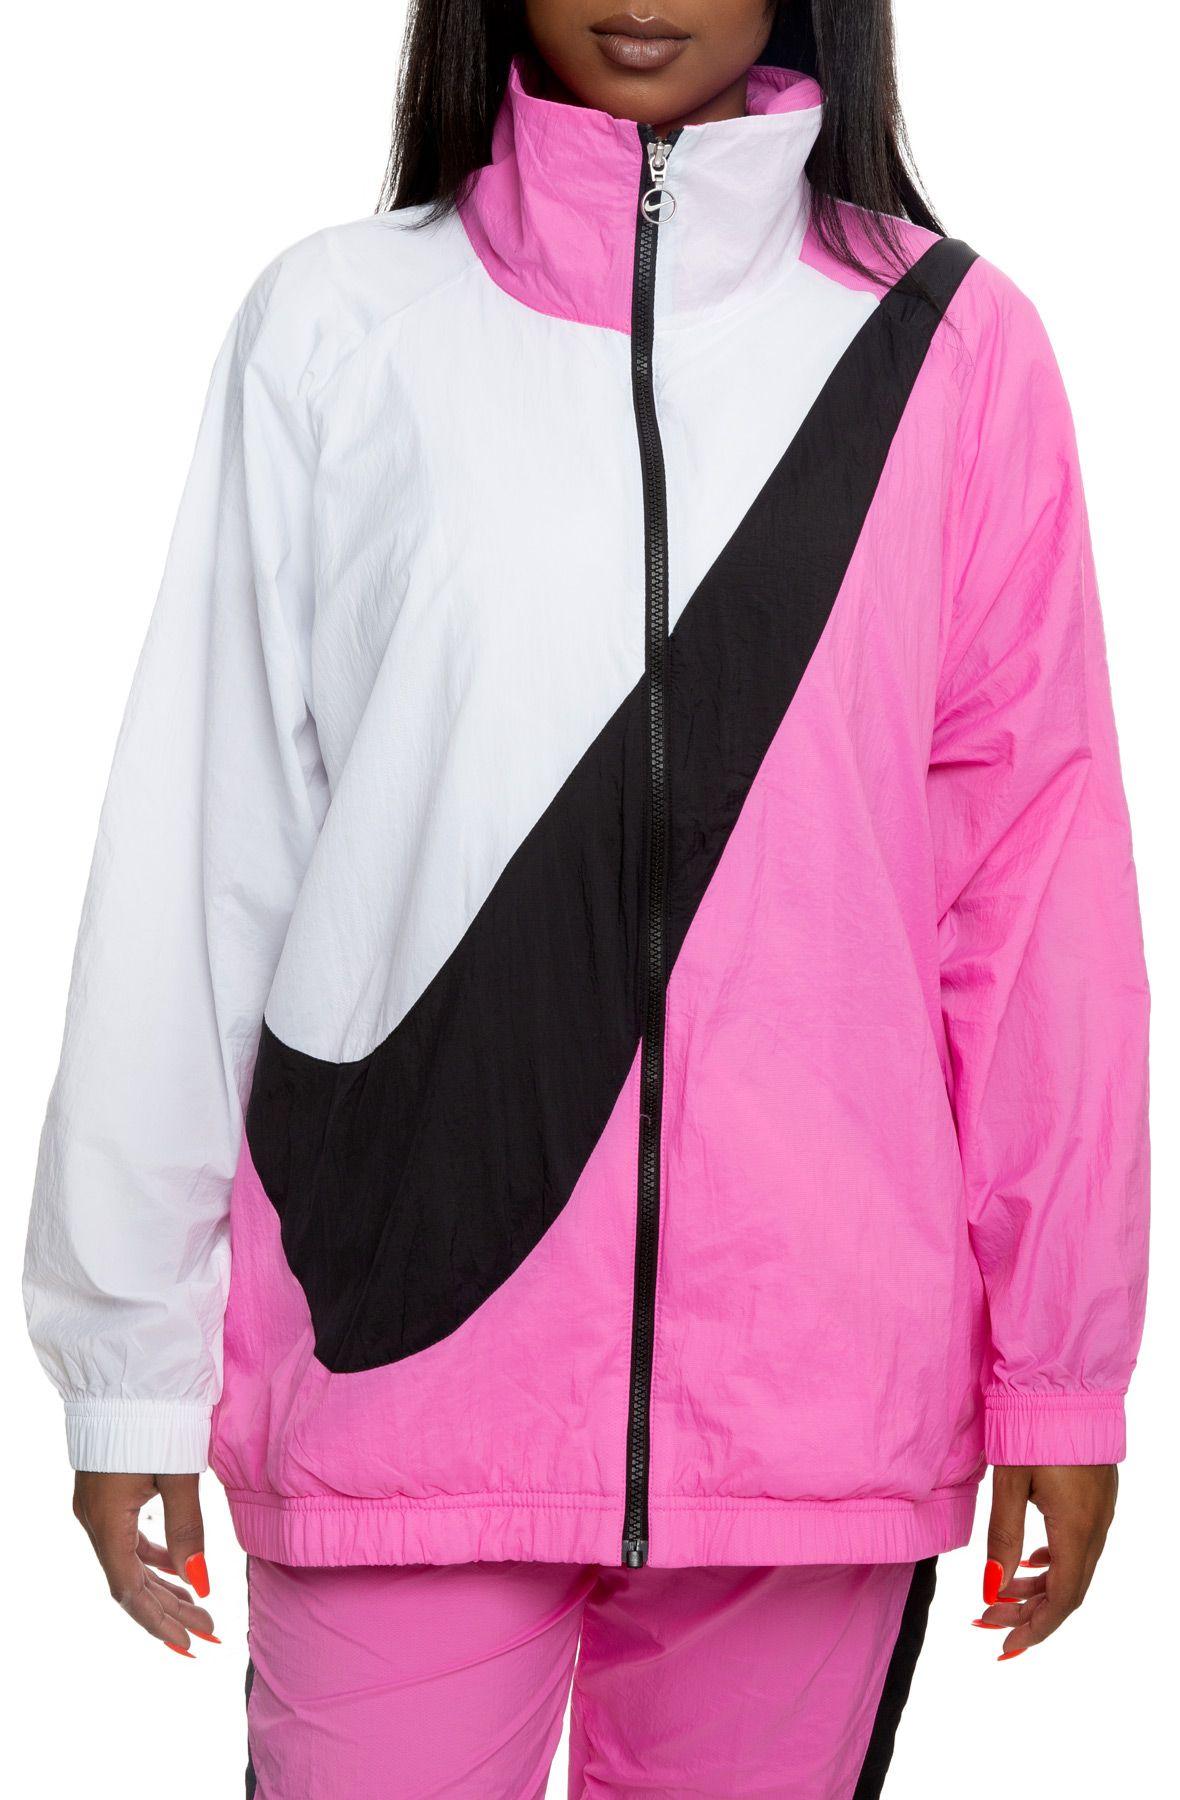 Deudor Heredero Acercarse  Sportswear Swoosh Woven Jacket